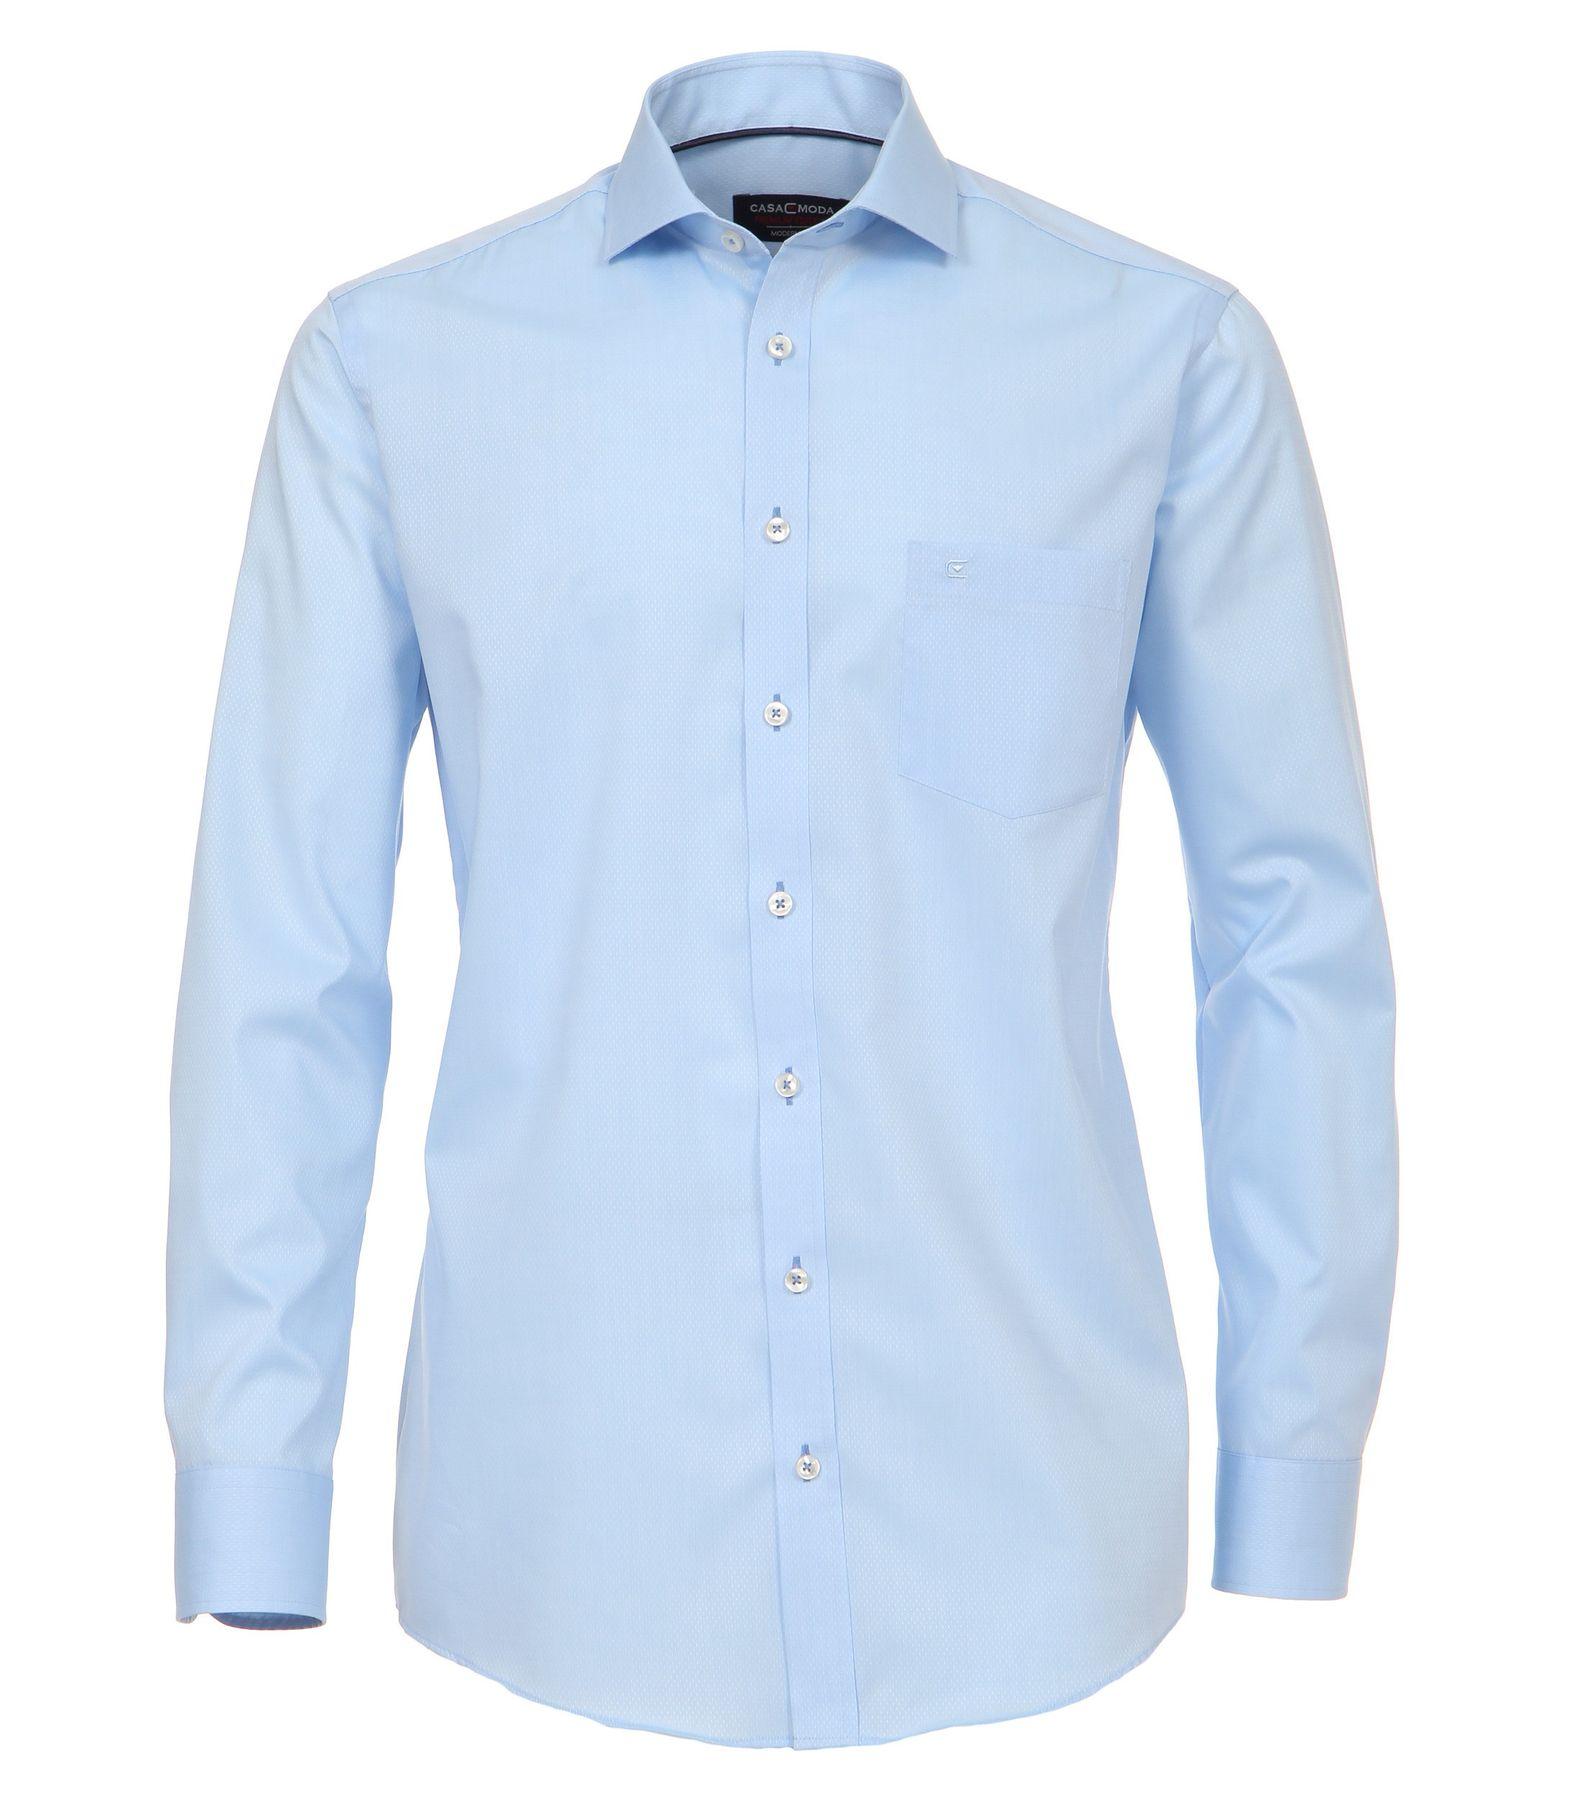 Casa Moda - Modern Fit - Herren langarm Hemd mit Shark Kragen, Uninah (372682600A) – Bild 5